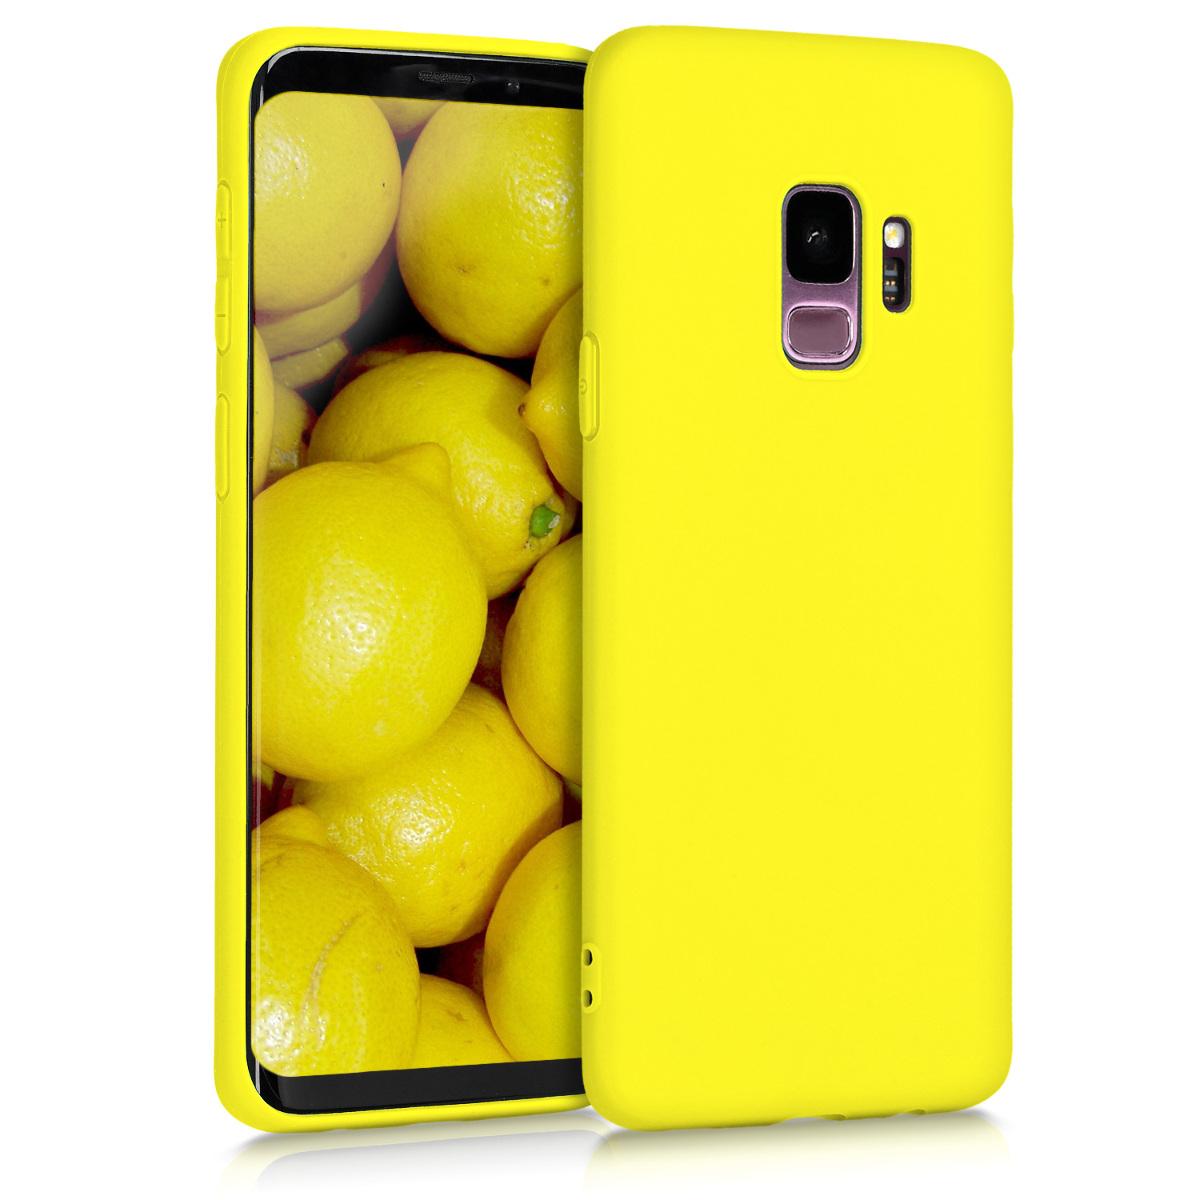 TPU Silikonové pouzdro pro Samsung Galaxy S9 - Soft Flexible Protective Phone Cover - Vibrant Yellow